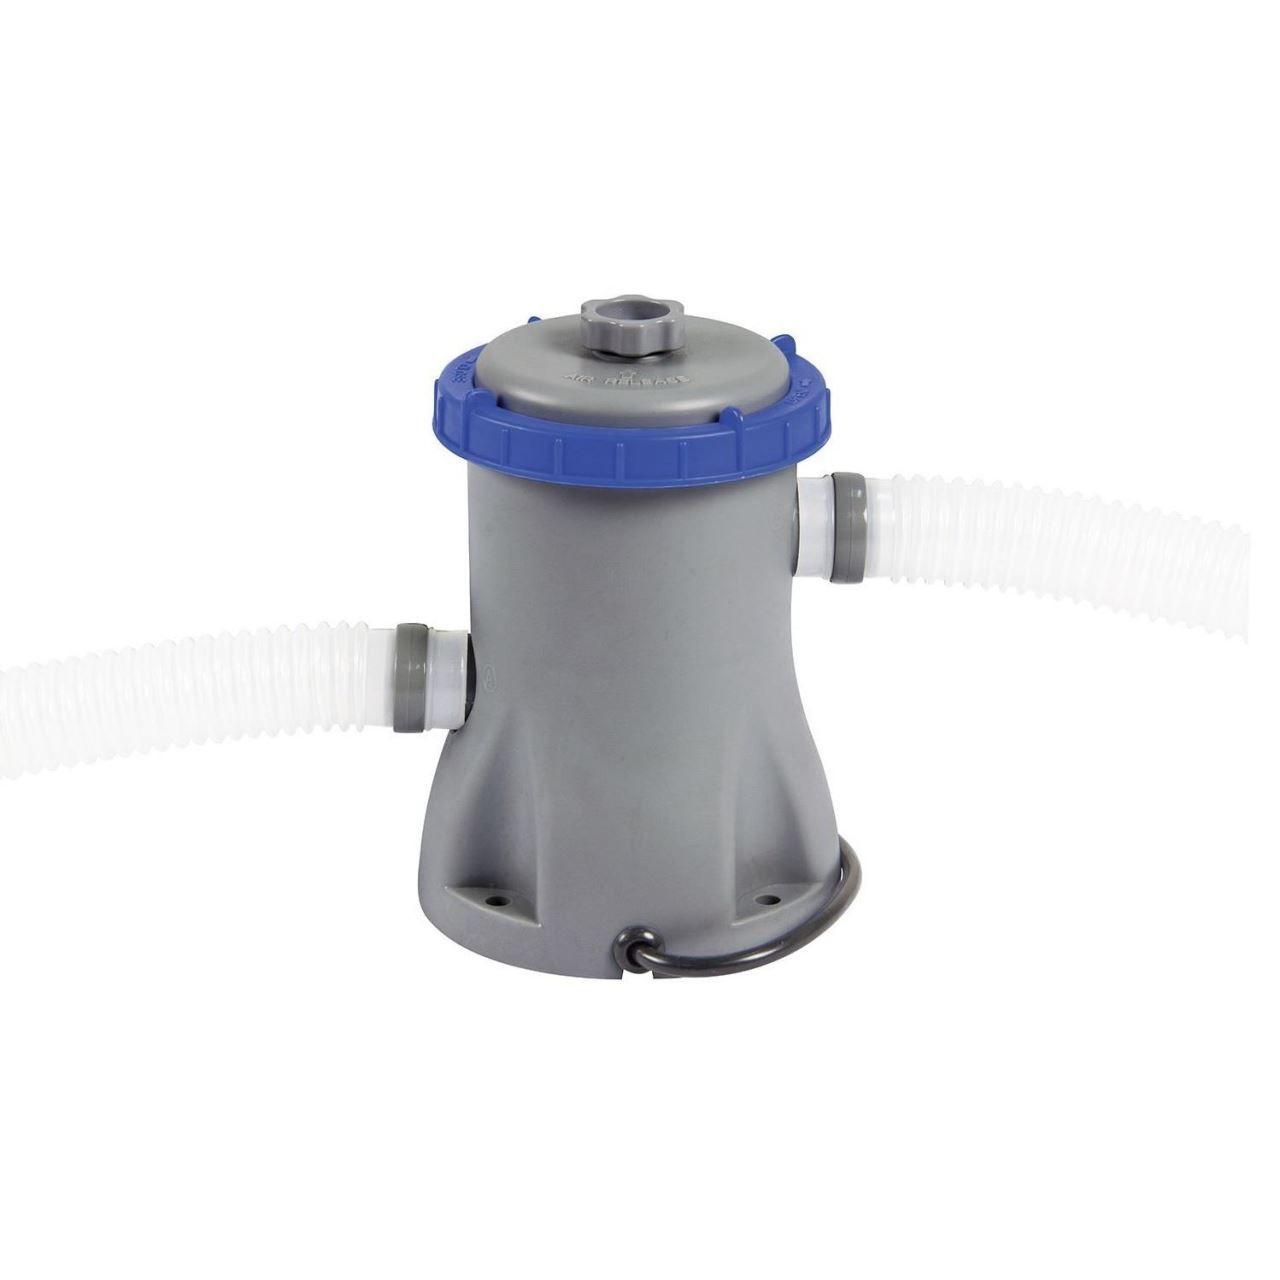 Pompa Cu Filtru Pentru Curatat Piscine, Bestway 58381, Flowclear, 1249 L/h dedans Filtre Pompe Piscine Intex